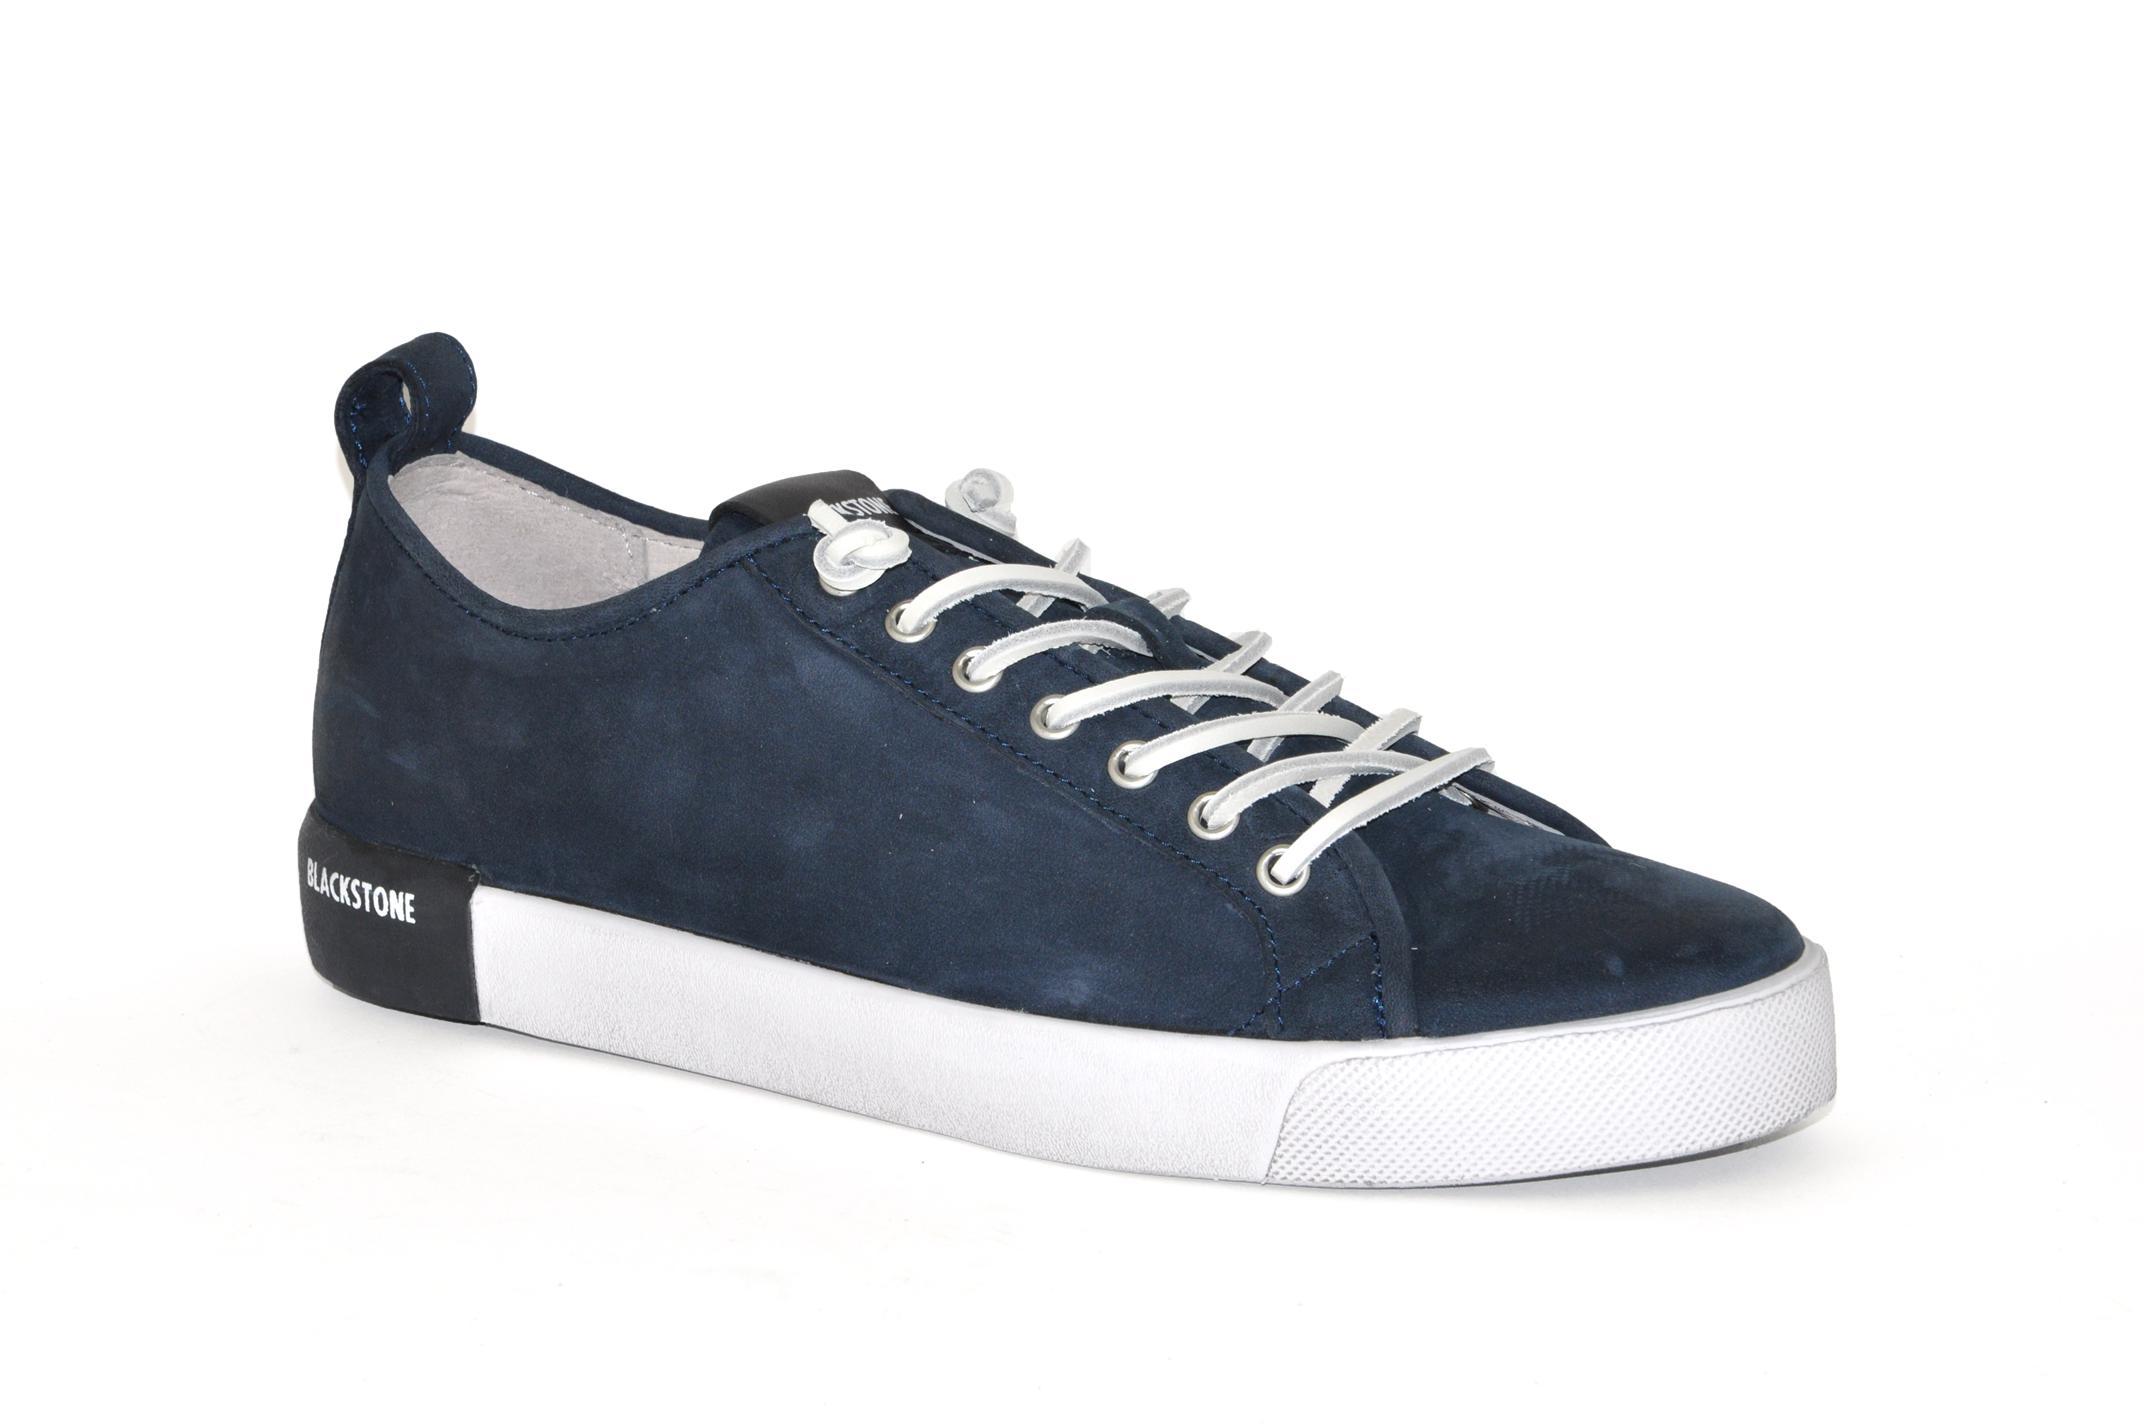 Afbeelding van Blackstone Blackstone artikelnummer PM66 sneaker blauw